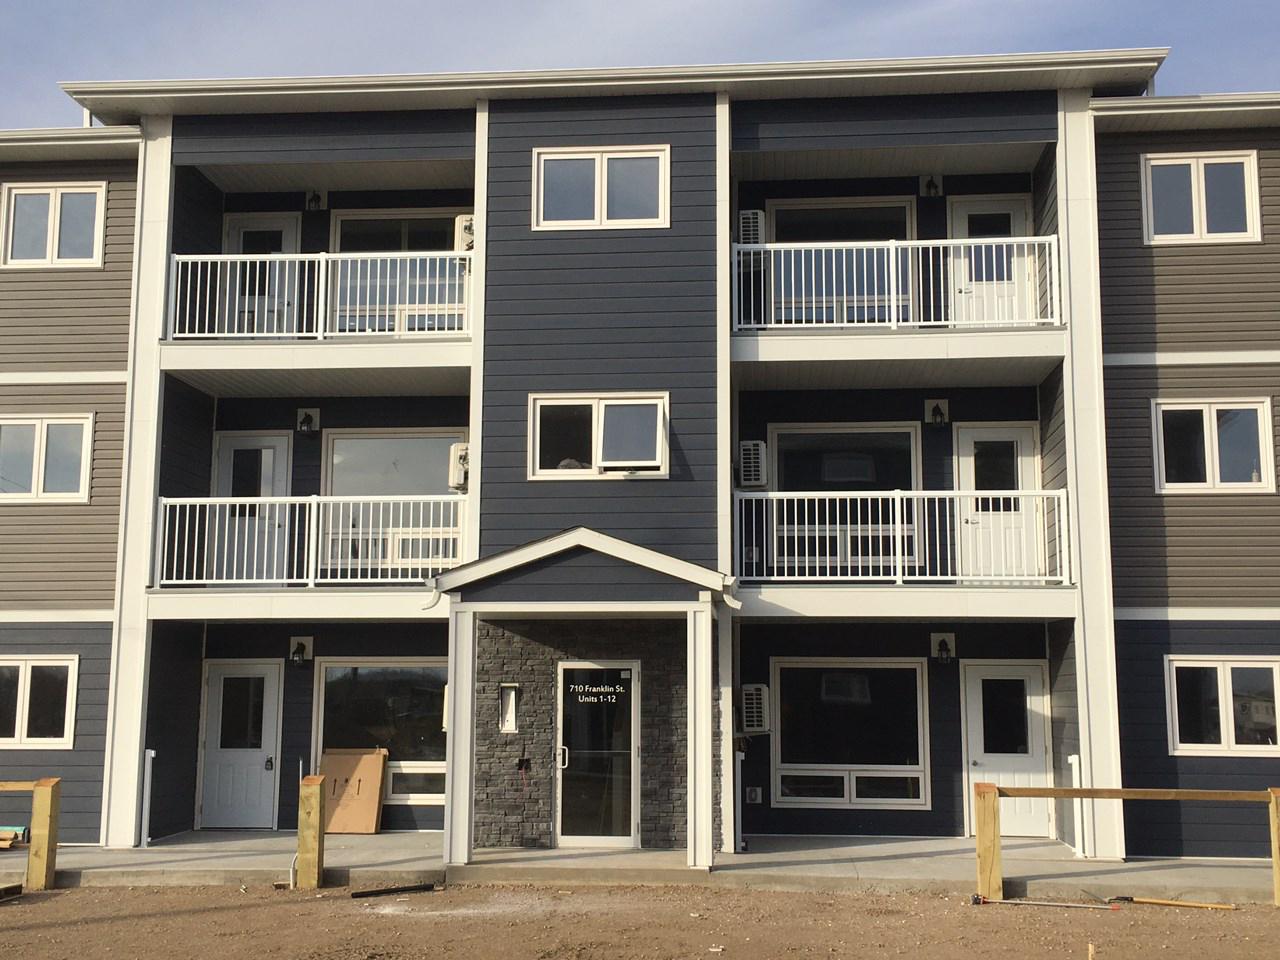 710 Franklin Street apartment developed by Keller Developments general contractors